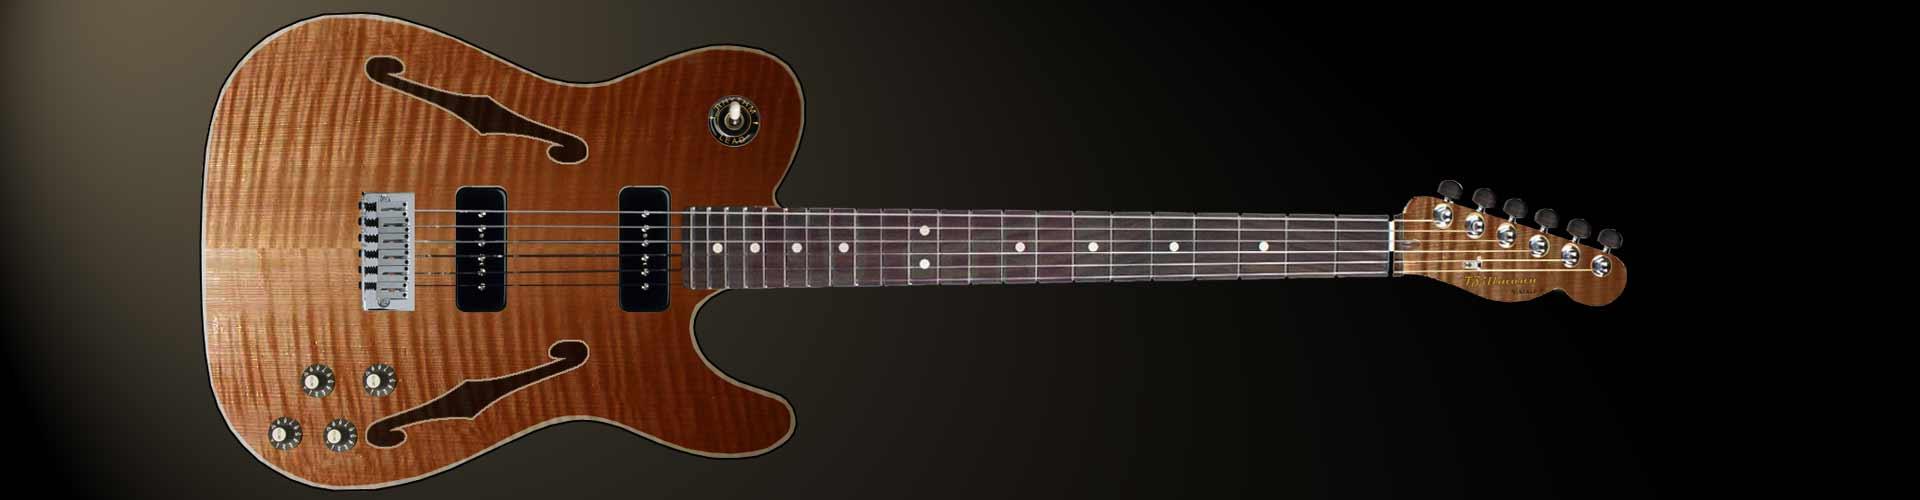 e gitarren strings and wood gitarrenbau aus hamm. Black Bedroom Furniture Sets. Home Design Ideas